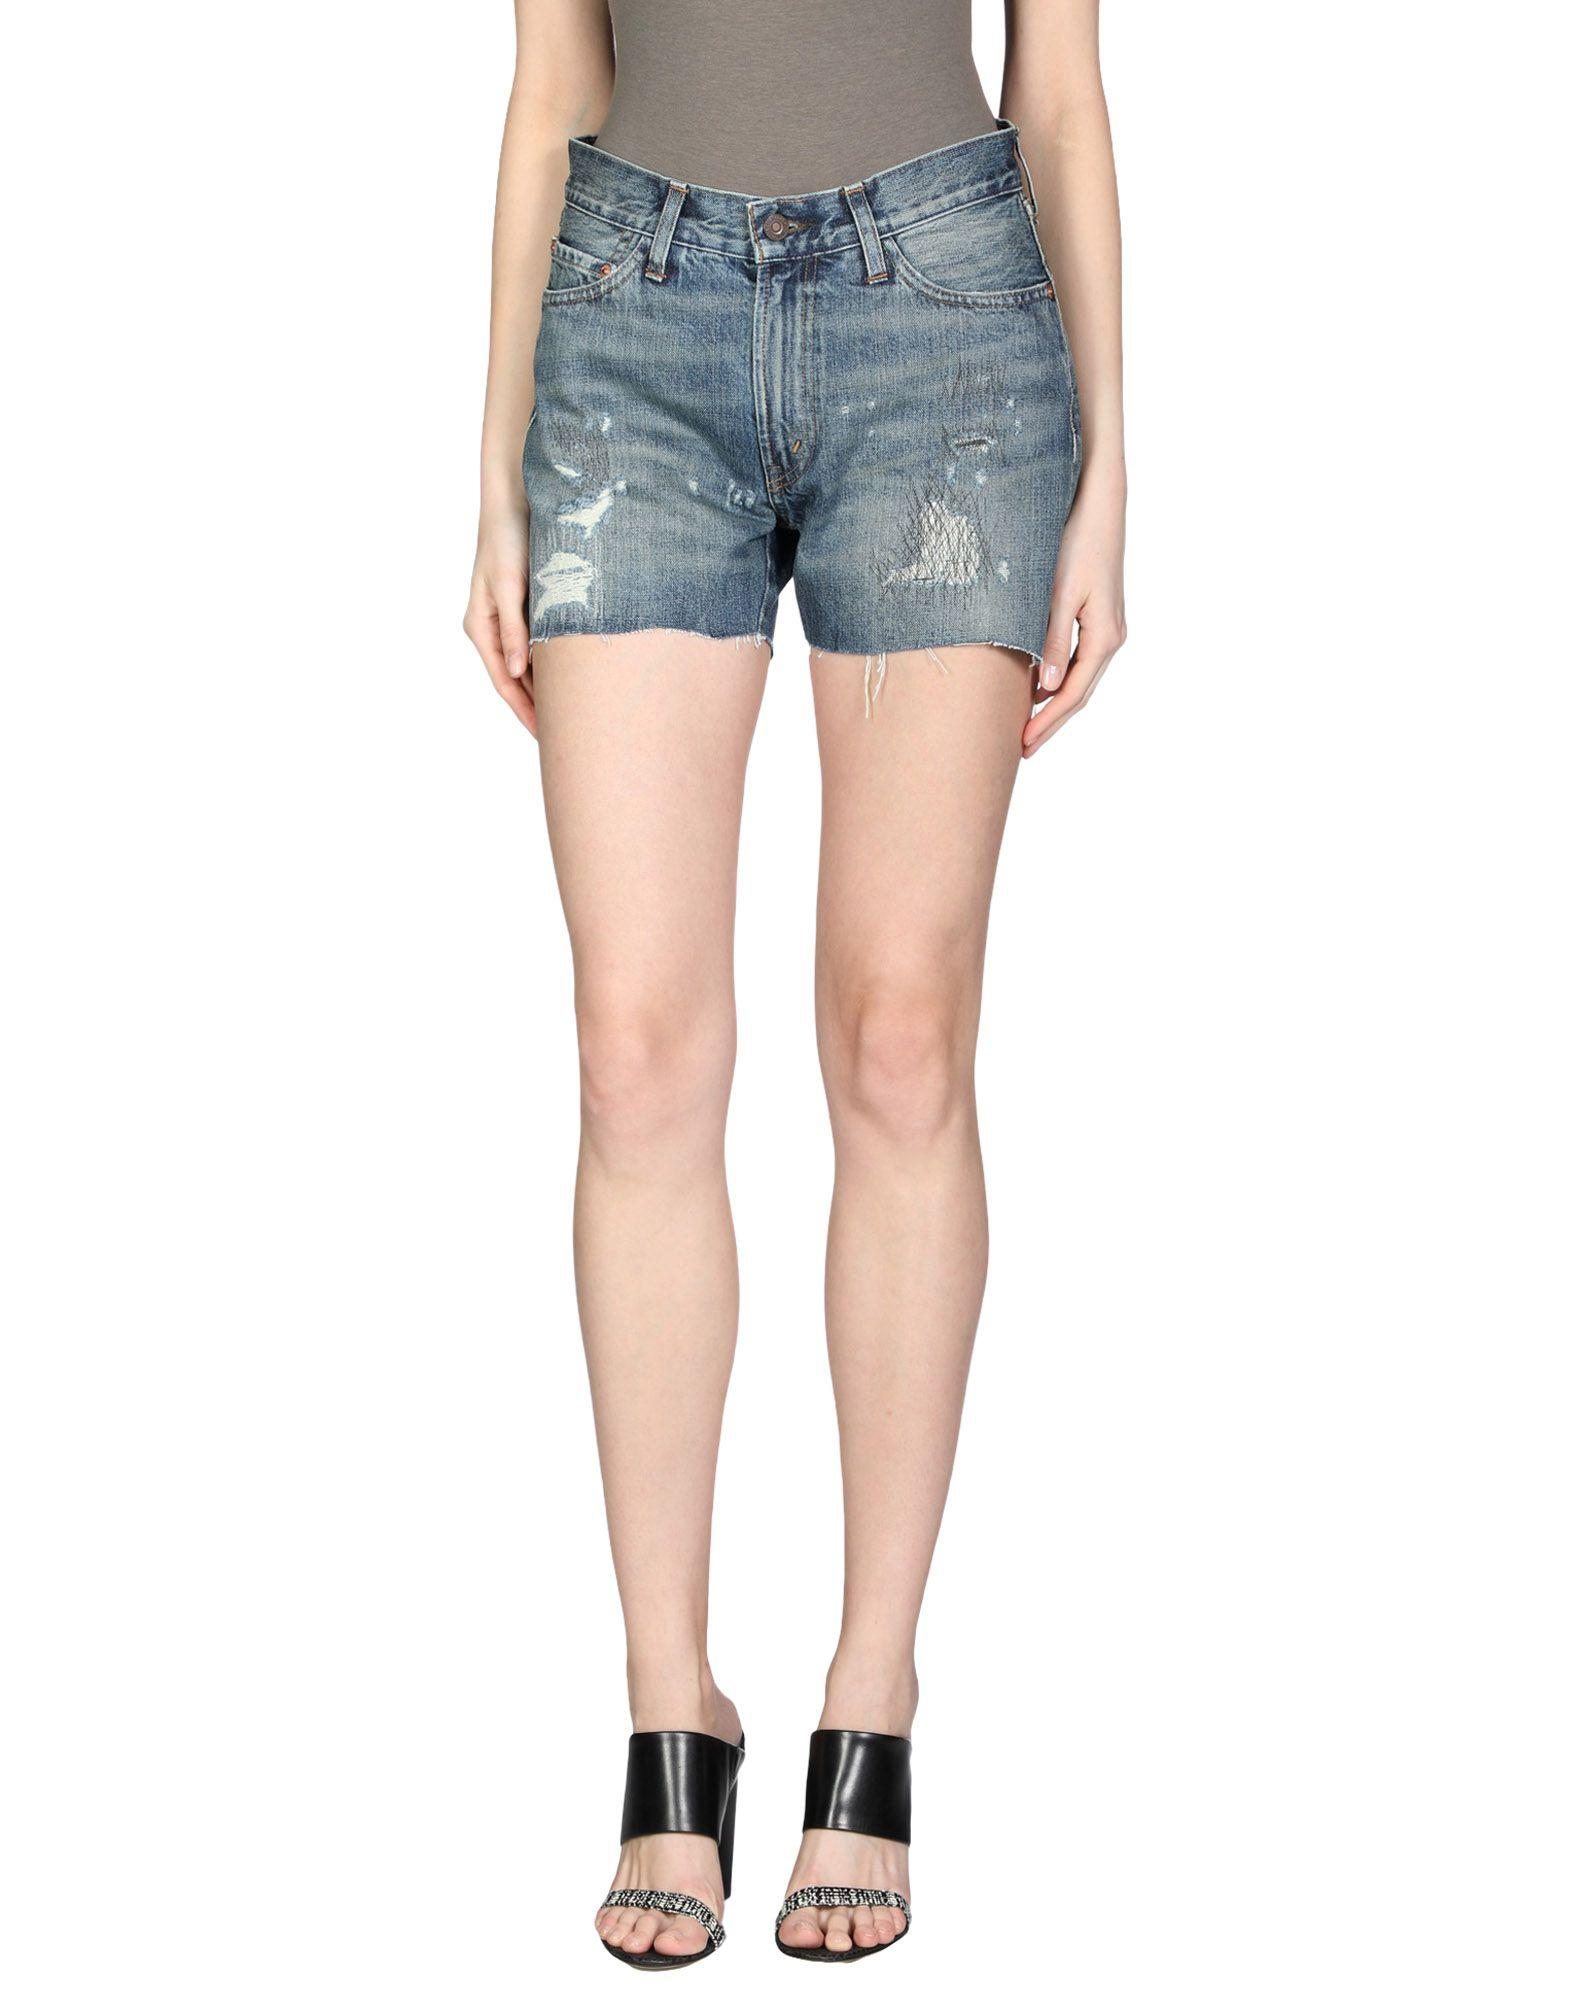 Levi's Denim Shorts In Blue